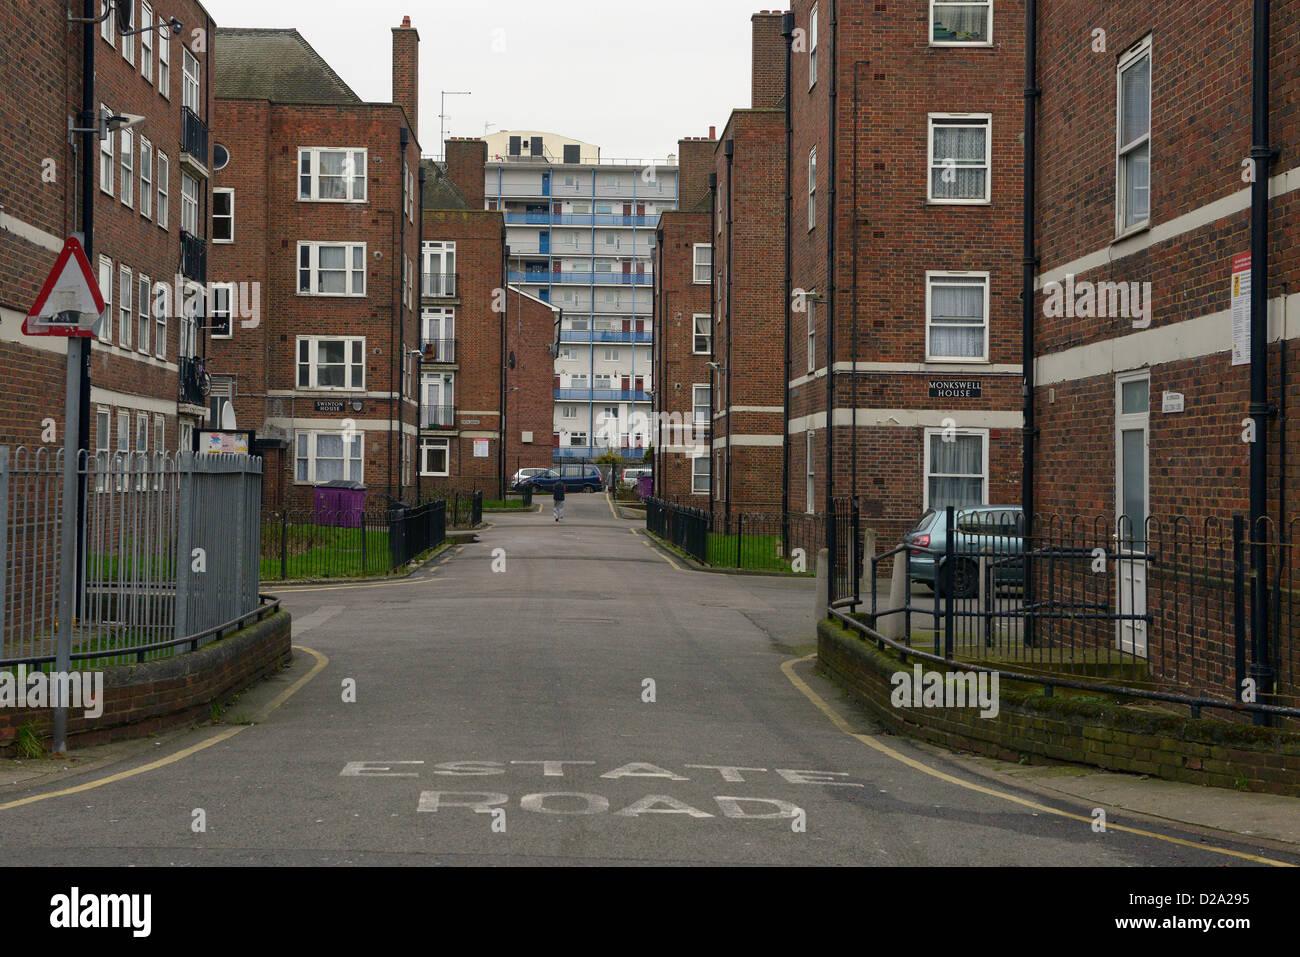 council housing estate bethnal green london - Stock Image